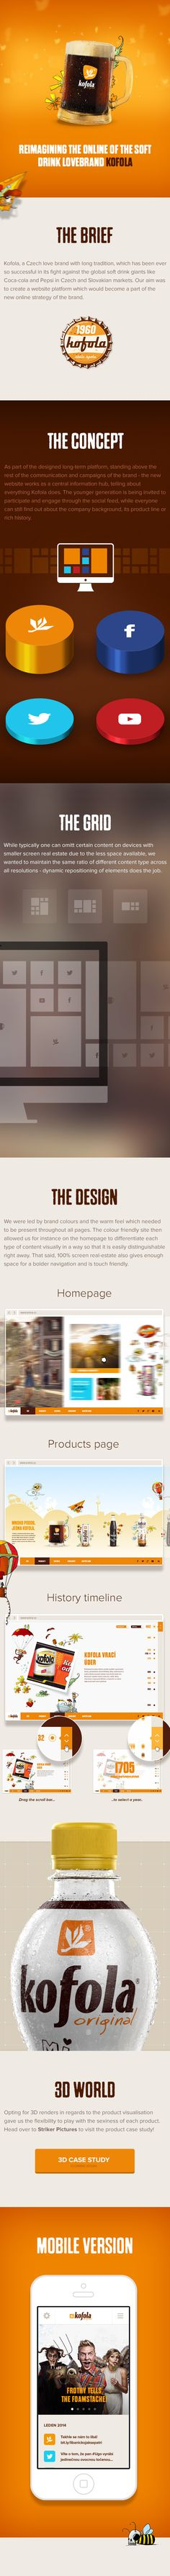 Kofola Online Reimagined by Lubos Buracinsky, via Behance Web Design Inspiration, Beverage, Layouts, Behance, Branding, Graphic Design, Website, Digital, Food